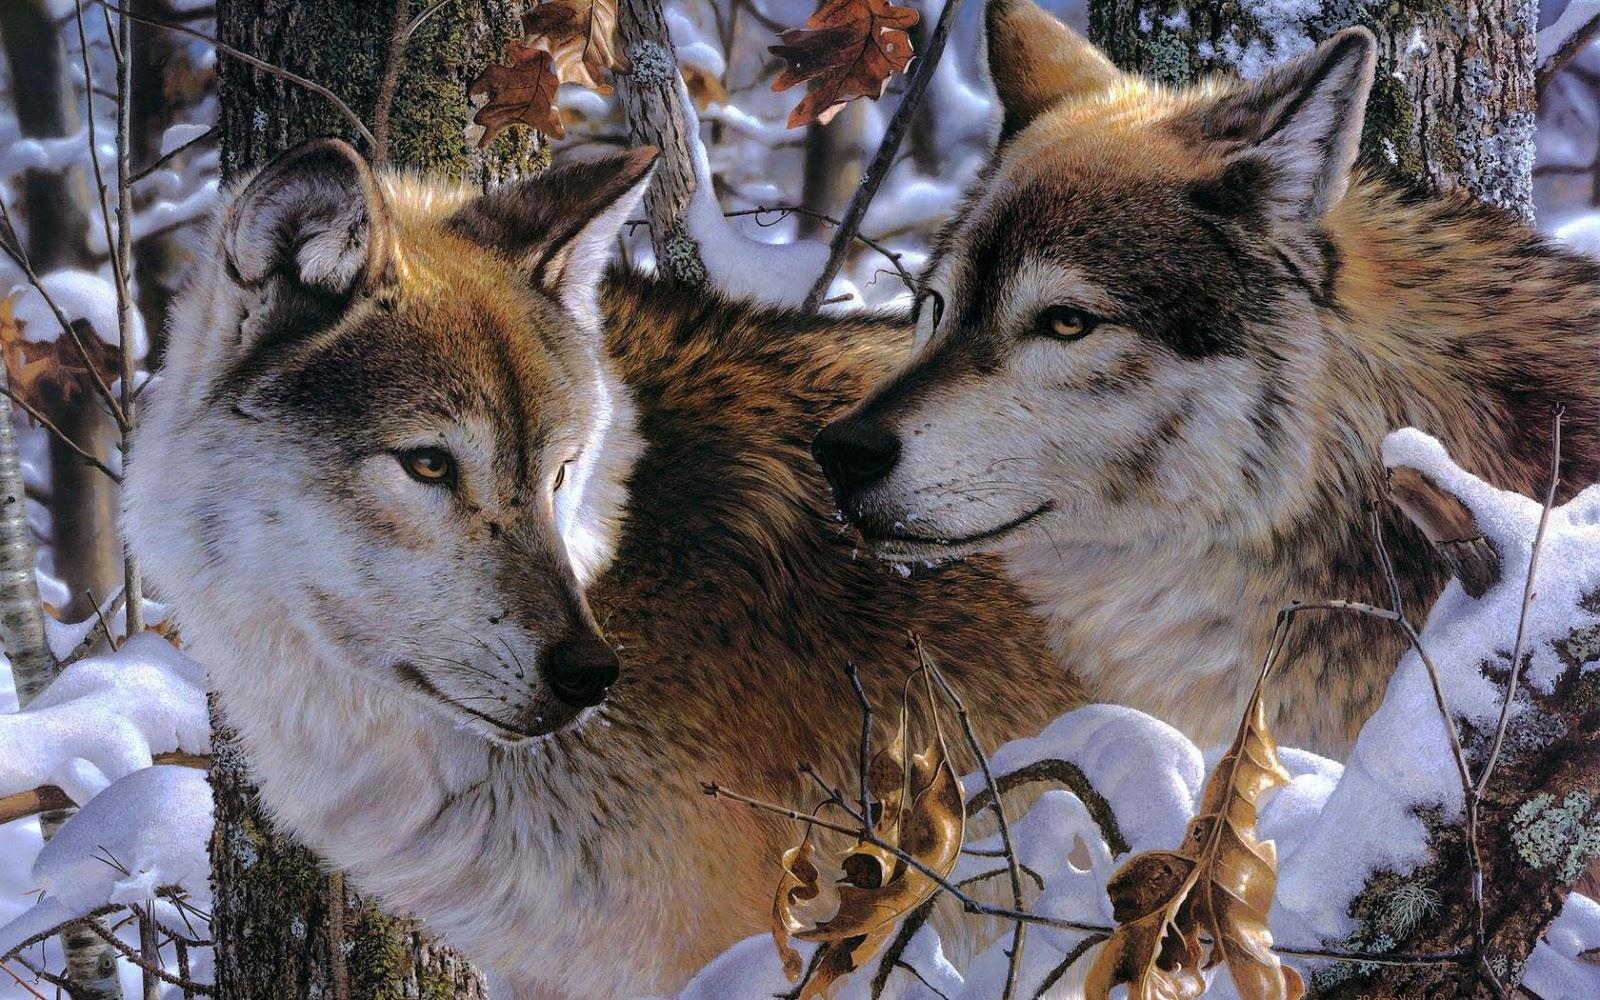 http://4.bp.blogspot.com/-ec1quWwbU34/UImvBGHgJlI/AAAAAAAAH7I/zlwag7fMUeE/s1600/portretfoto-van-twee-wolven-hd-wolf-wallpaper.jpg